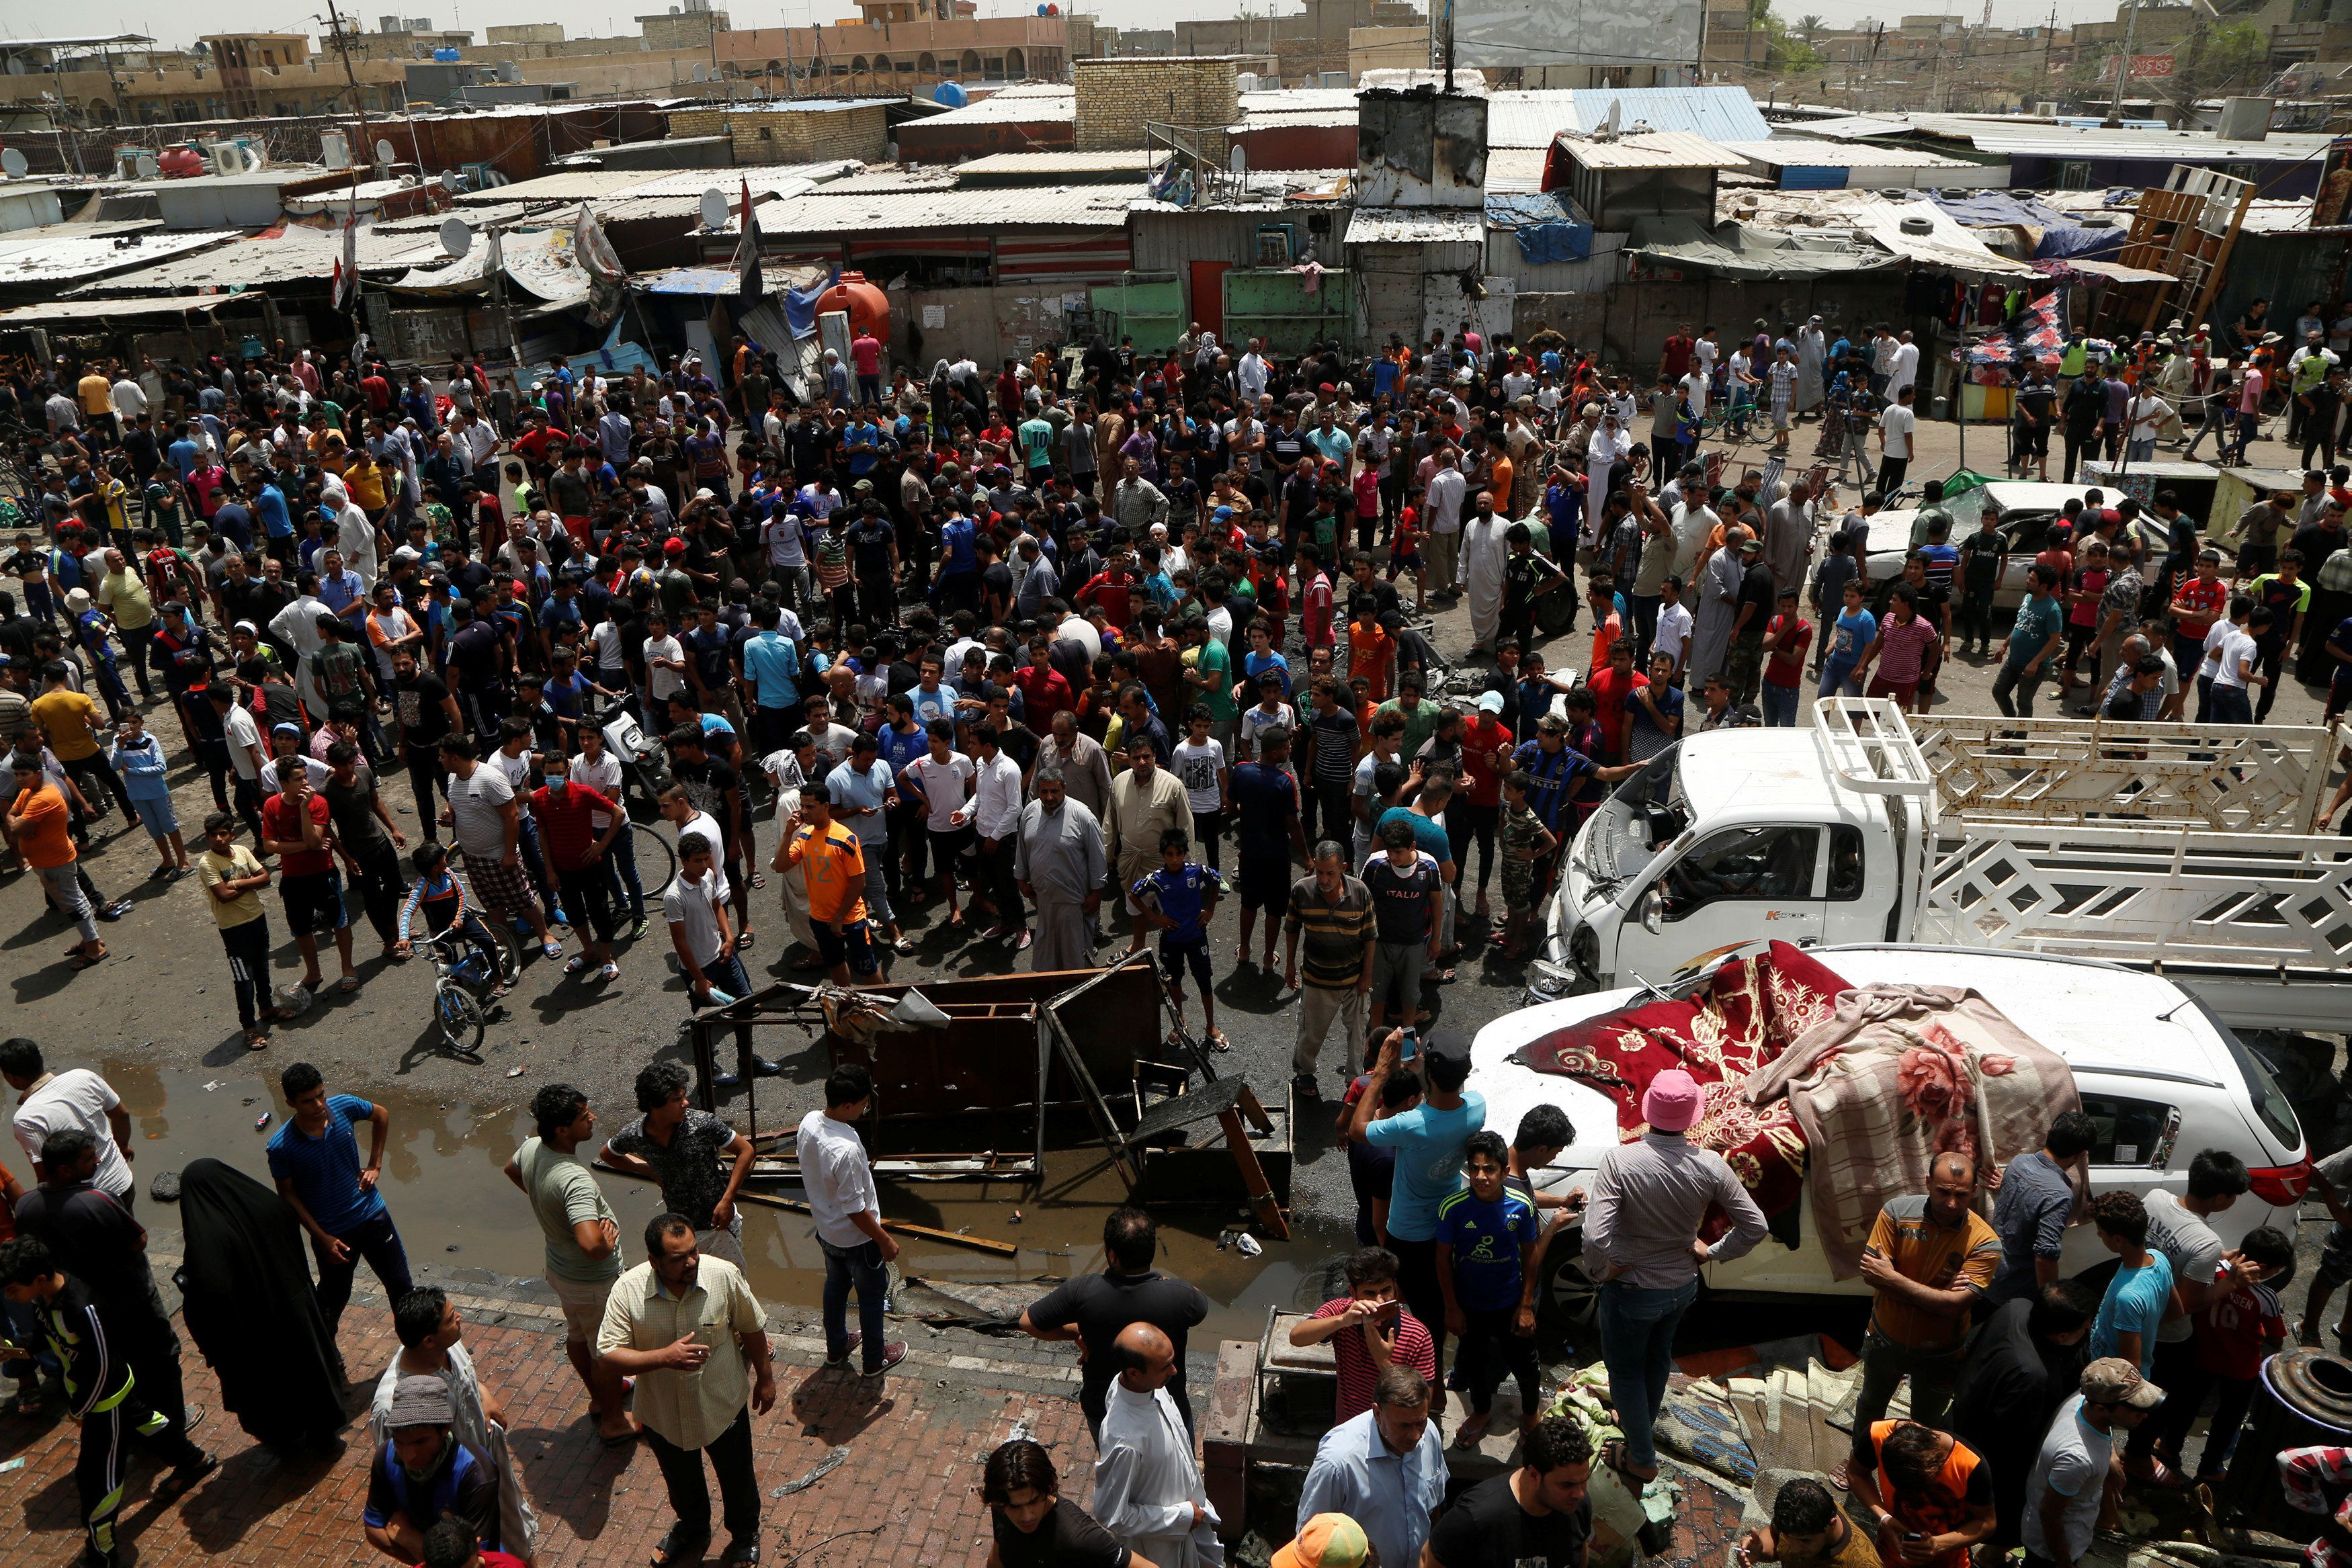 Car Bomb Explodes In Baghdad Market, Killing At Least 50